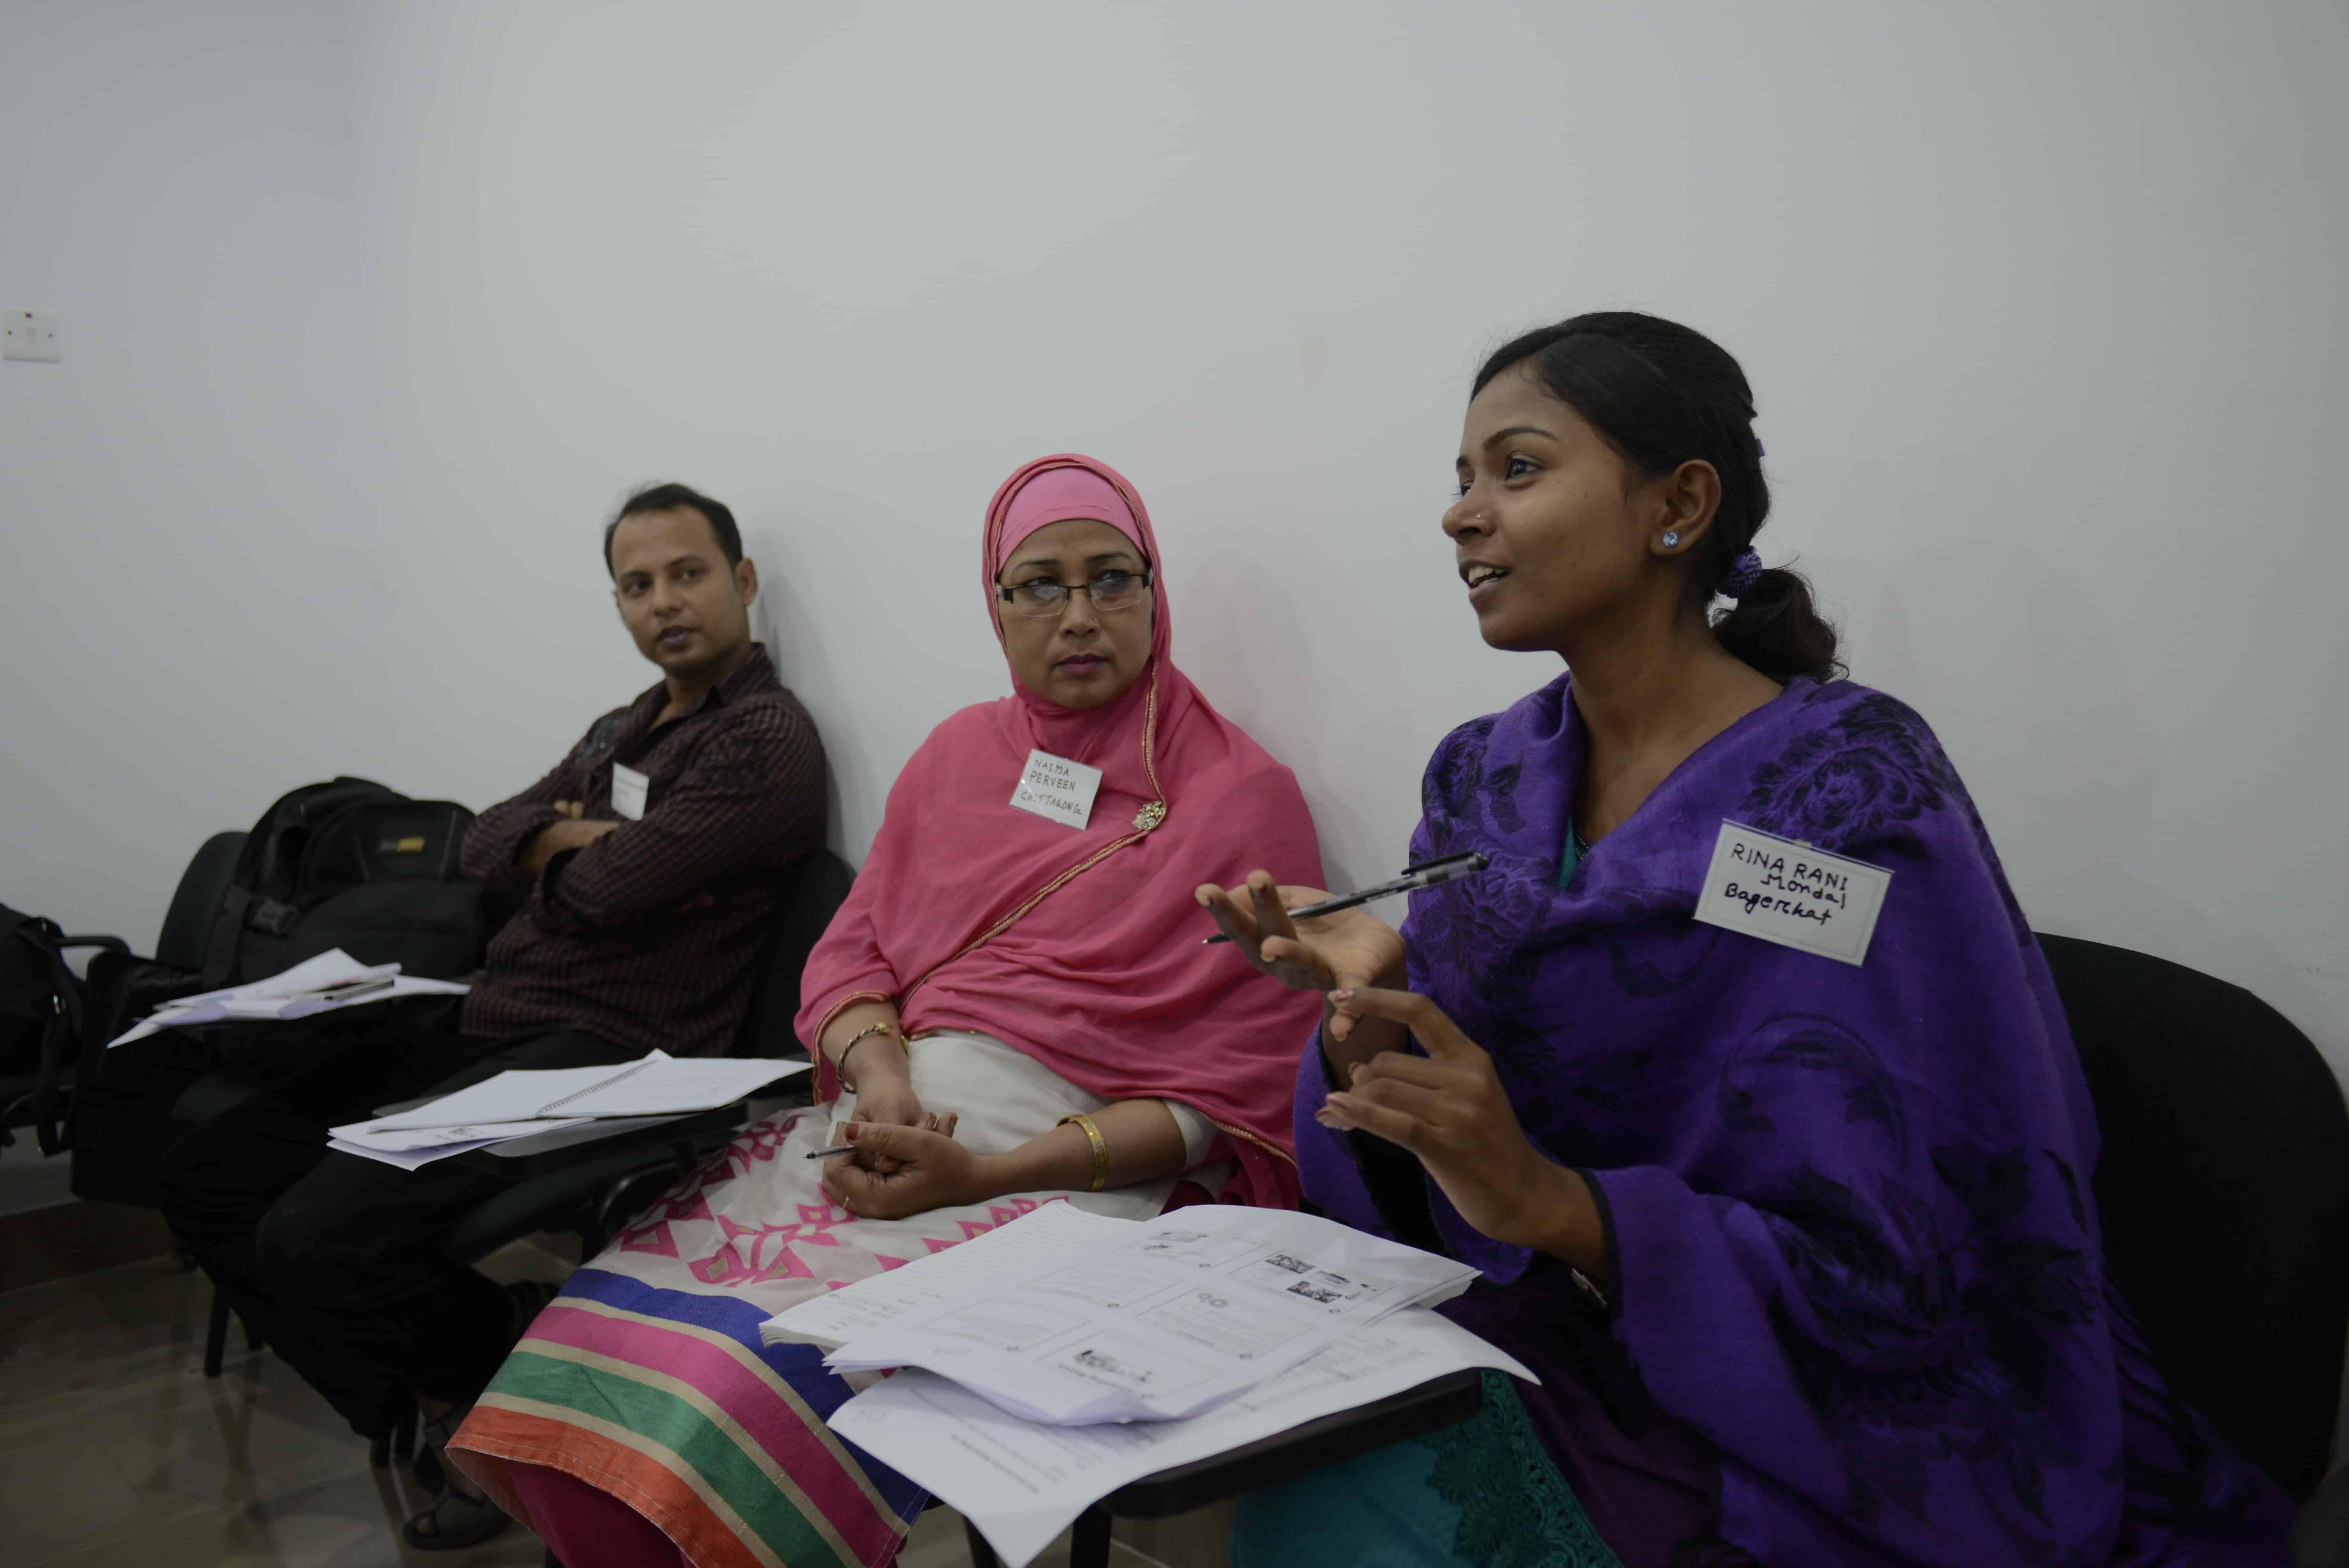 Archive-Bangladesh-PrinceClaus-Journalism-4